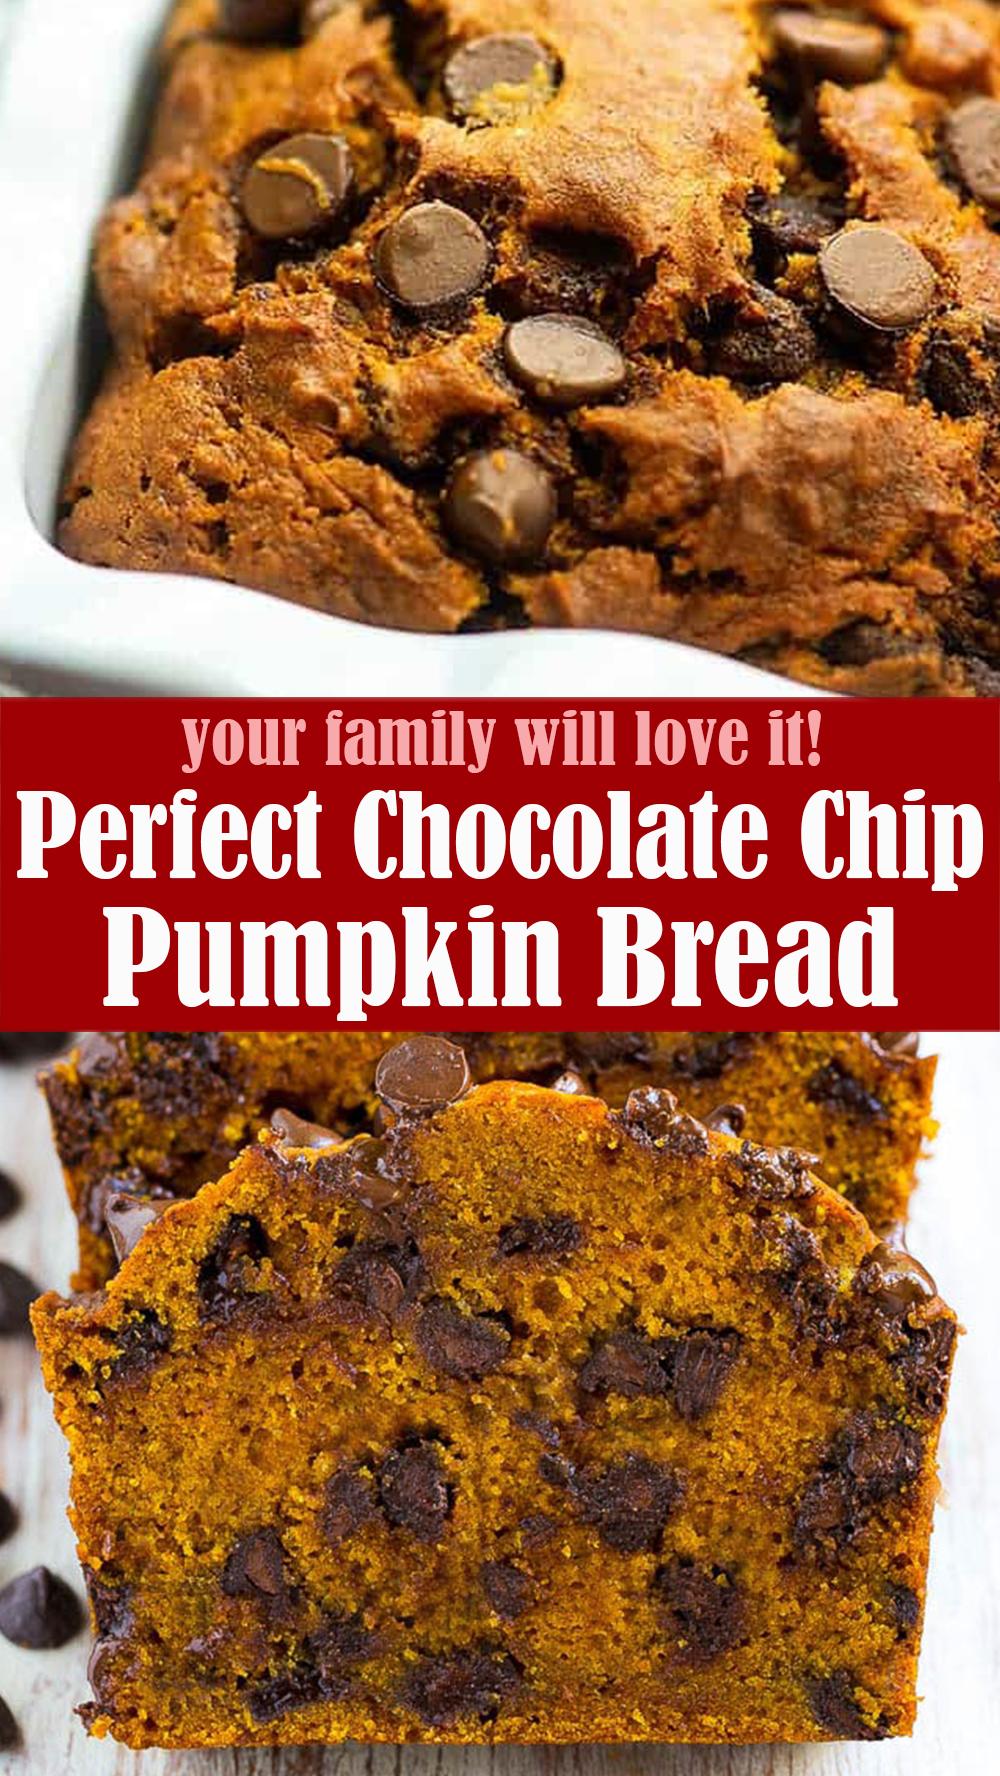 Perfect Chocolate Chip Pumpkin Bread